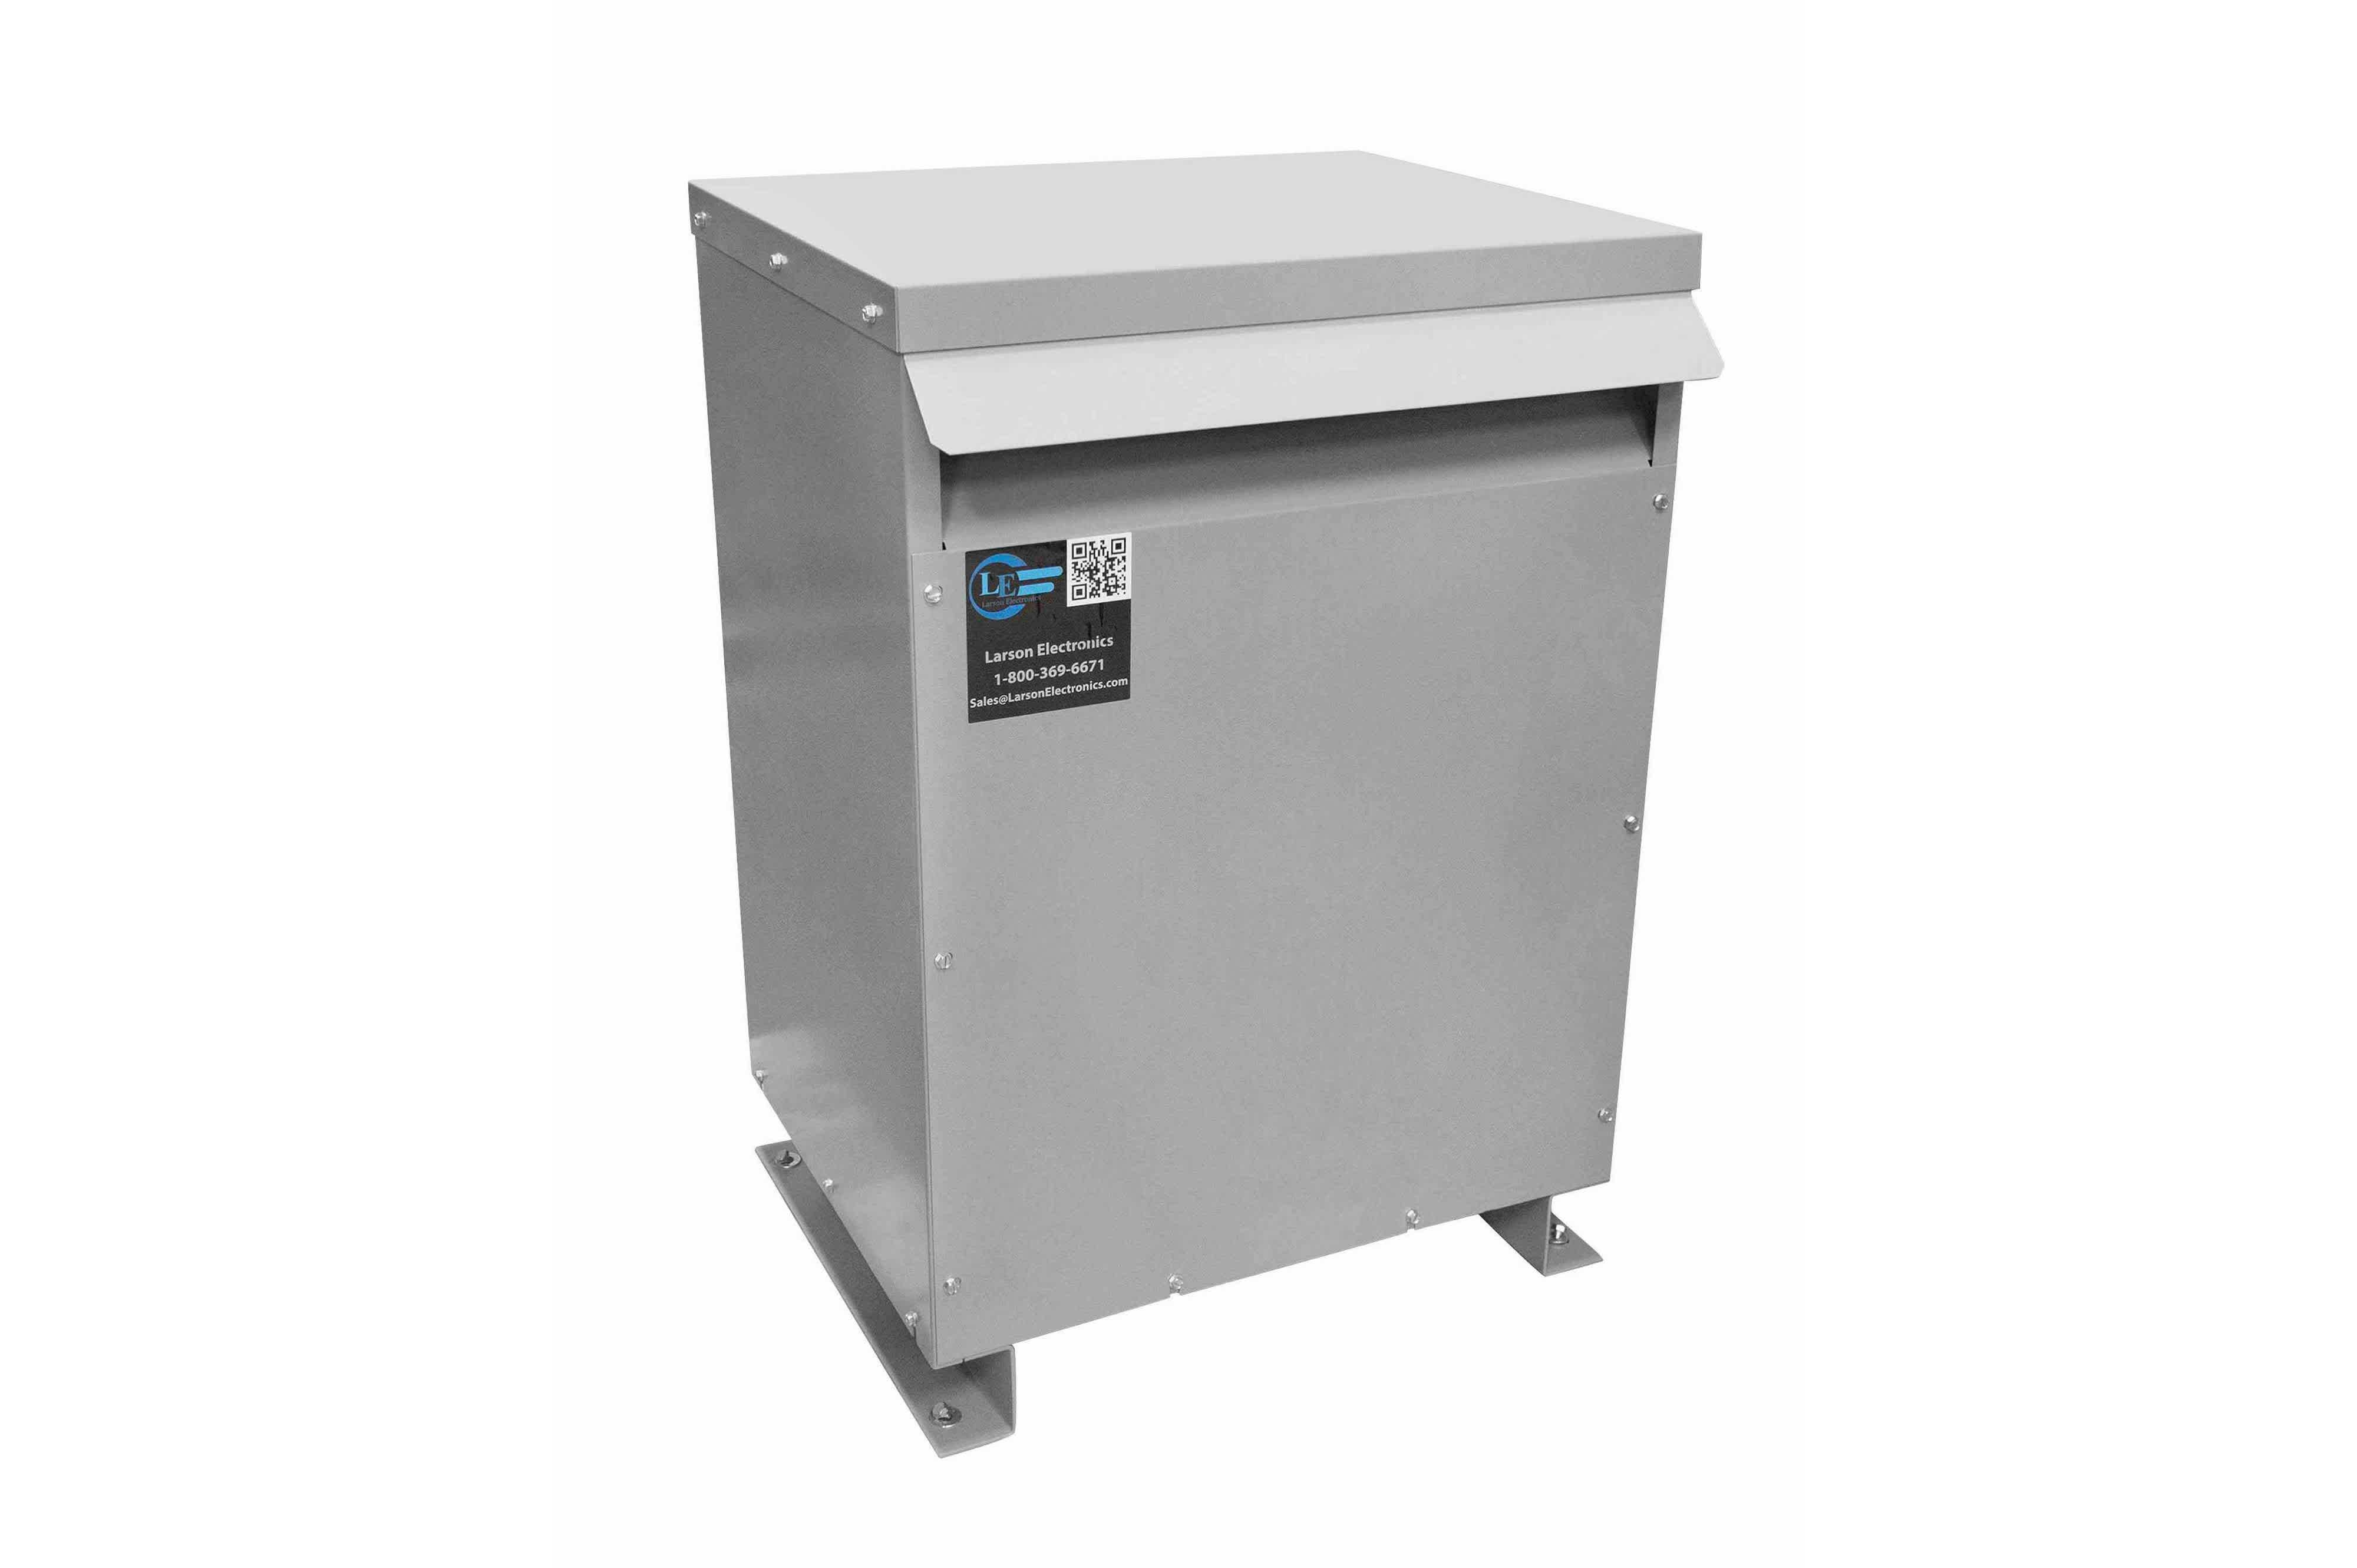 28 kVA 3PH Isolation Transformer, 415V Wye Primary, 208V Delta Secondary, N3R, Ventilated, 60 Hz